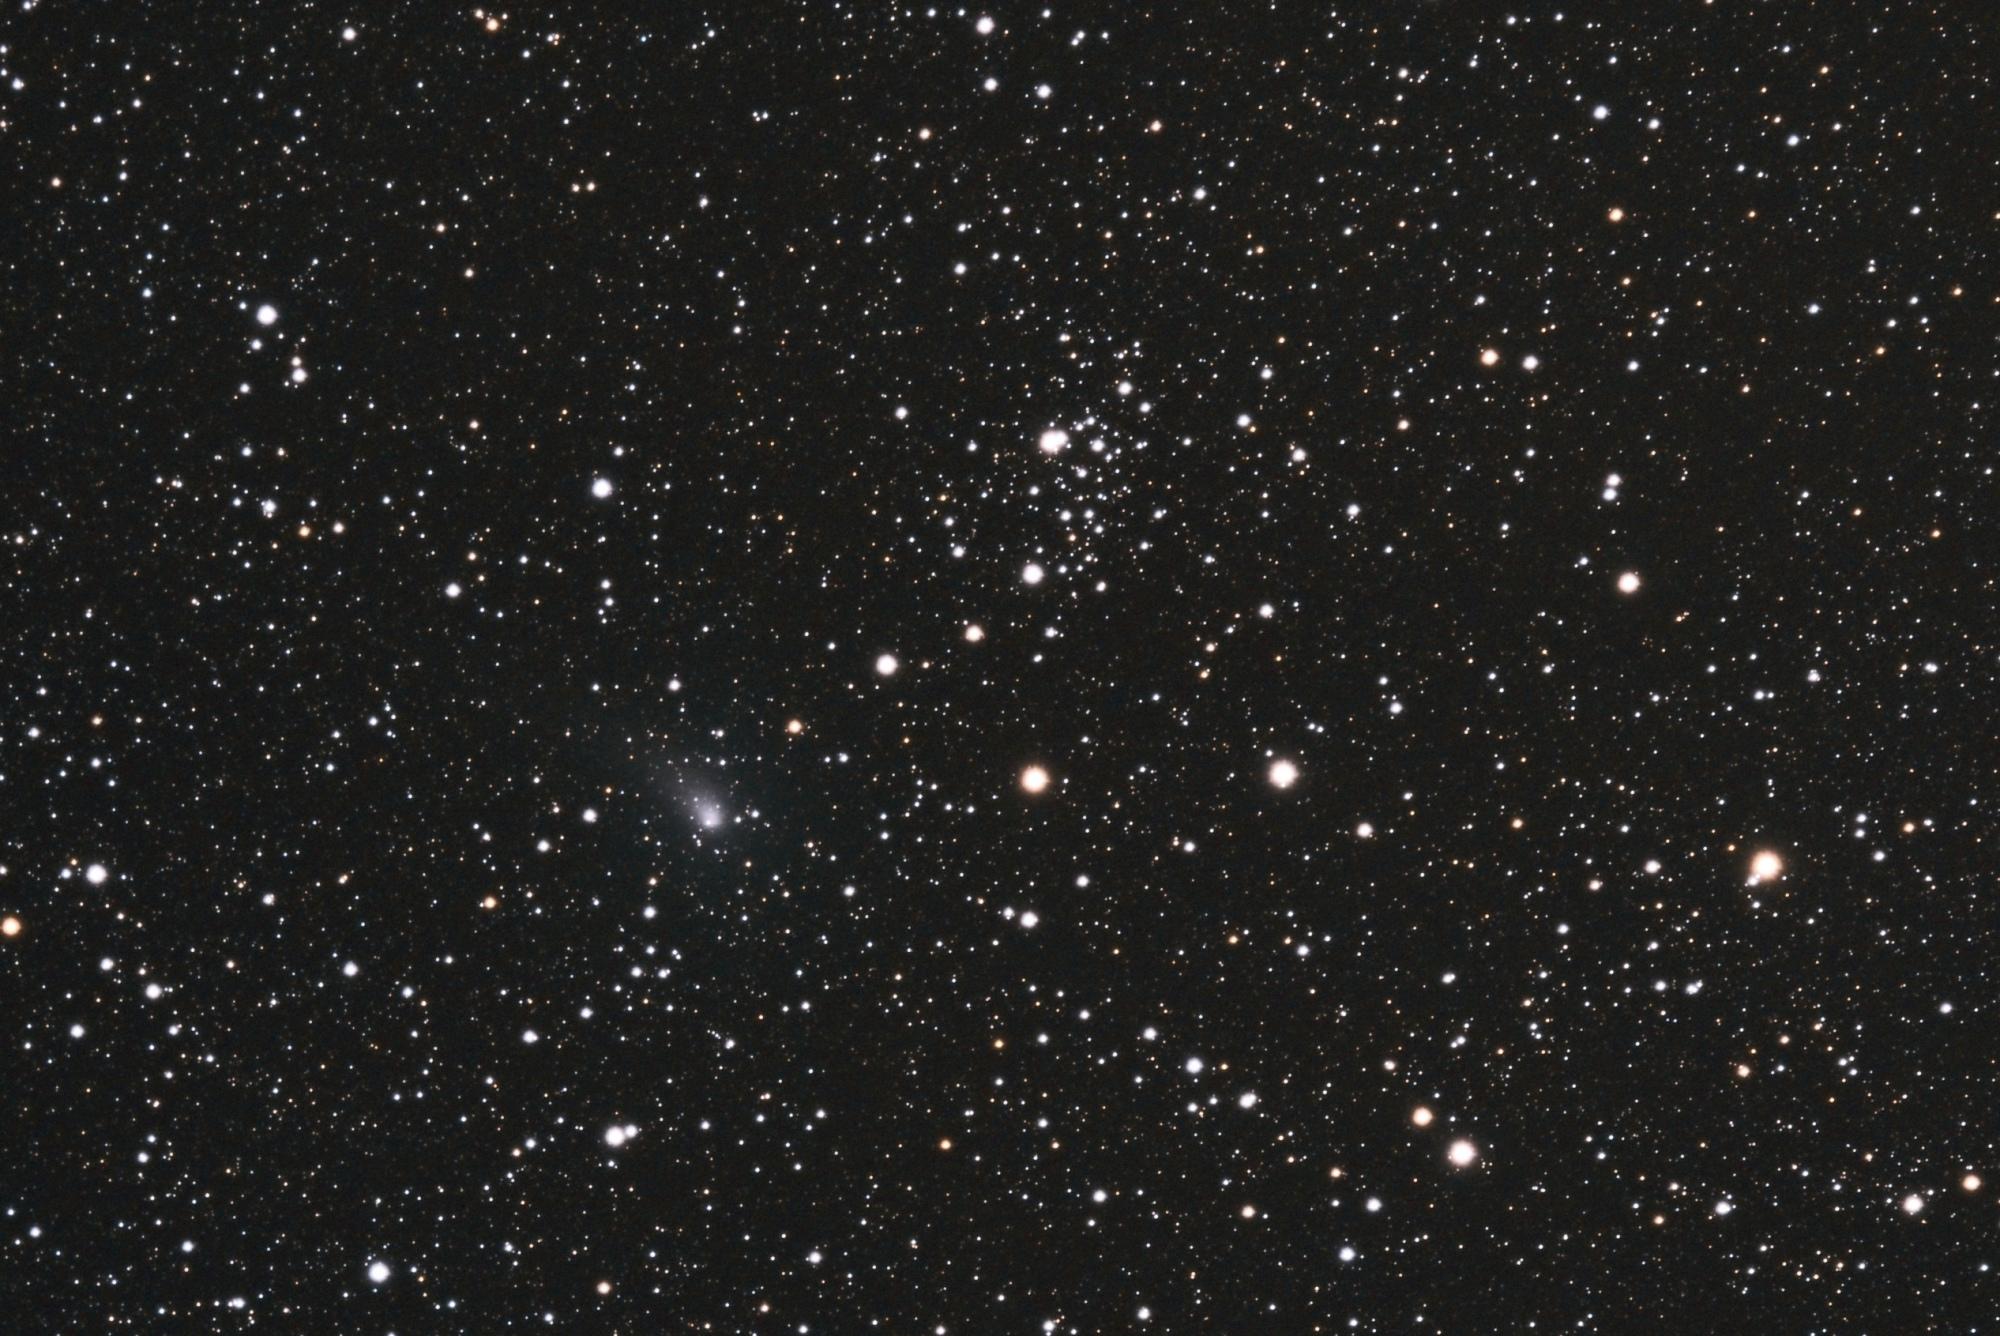 comete2.thumb.jpg.d7914b4e086802b1fdc6c44b546b70ce.jpg